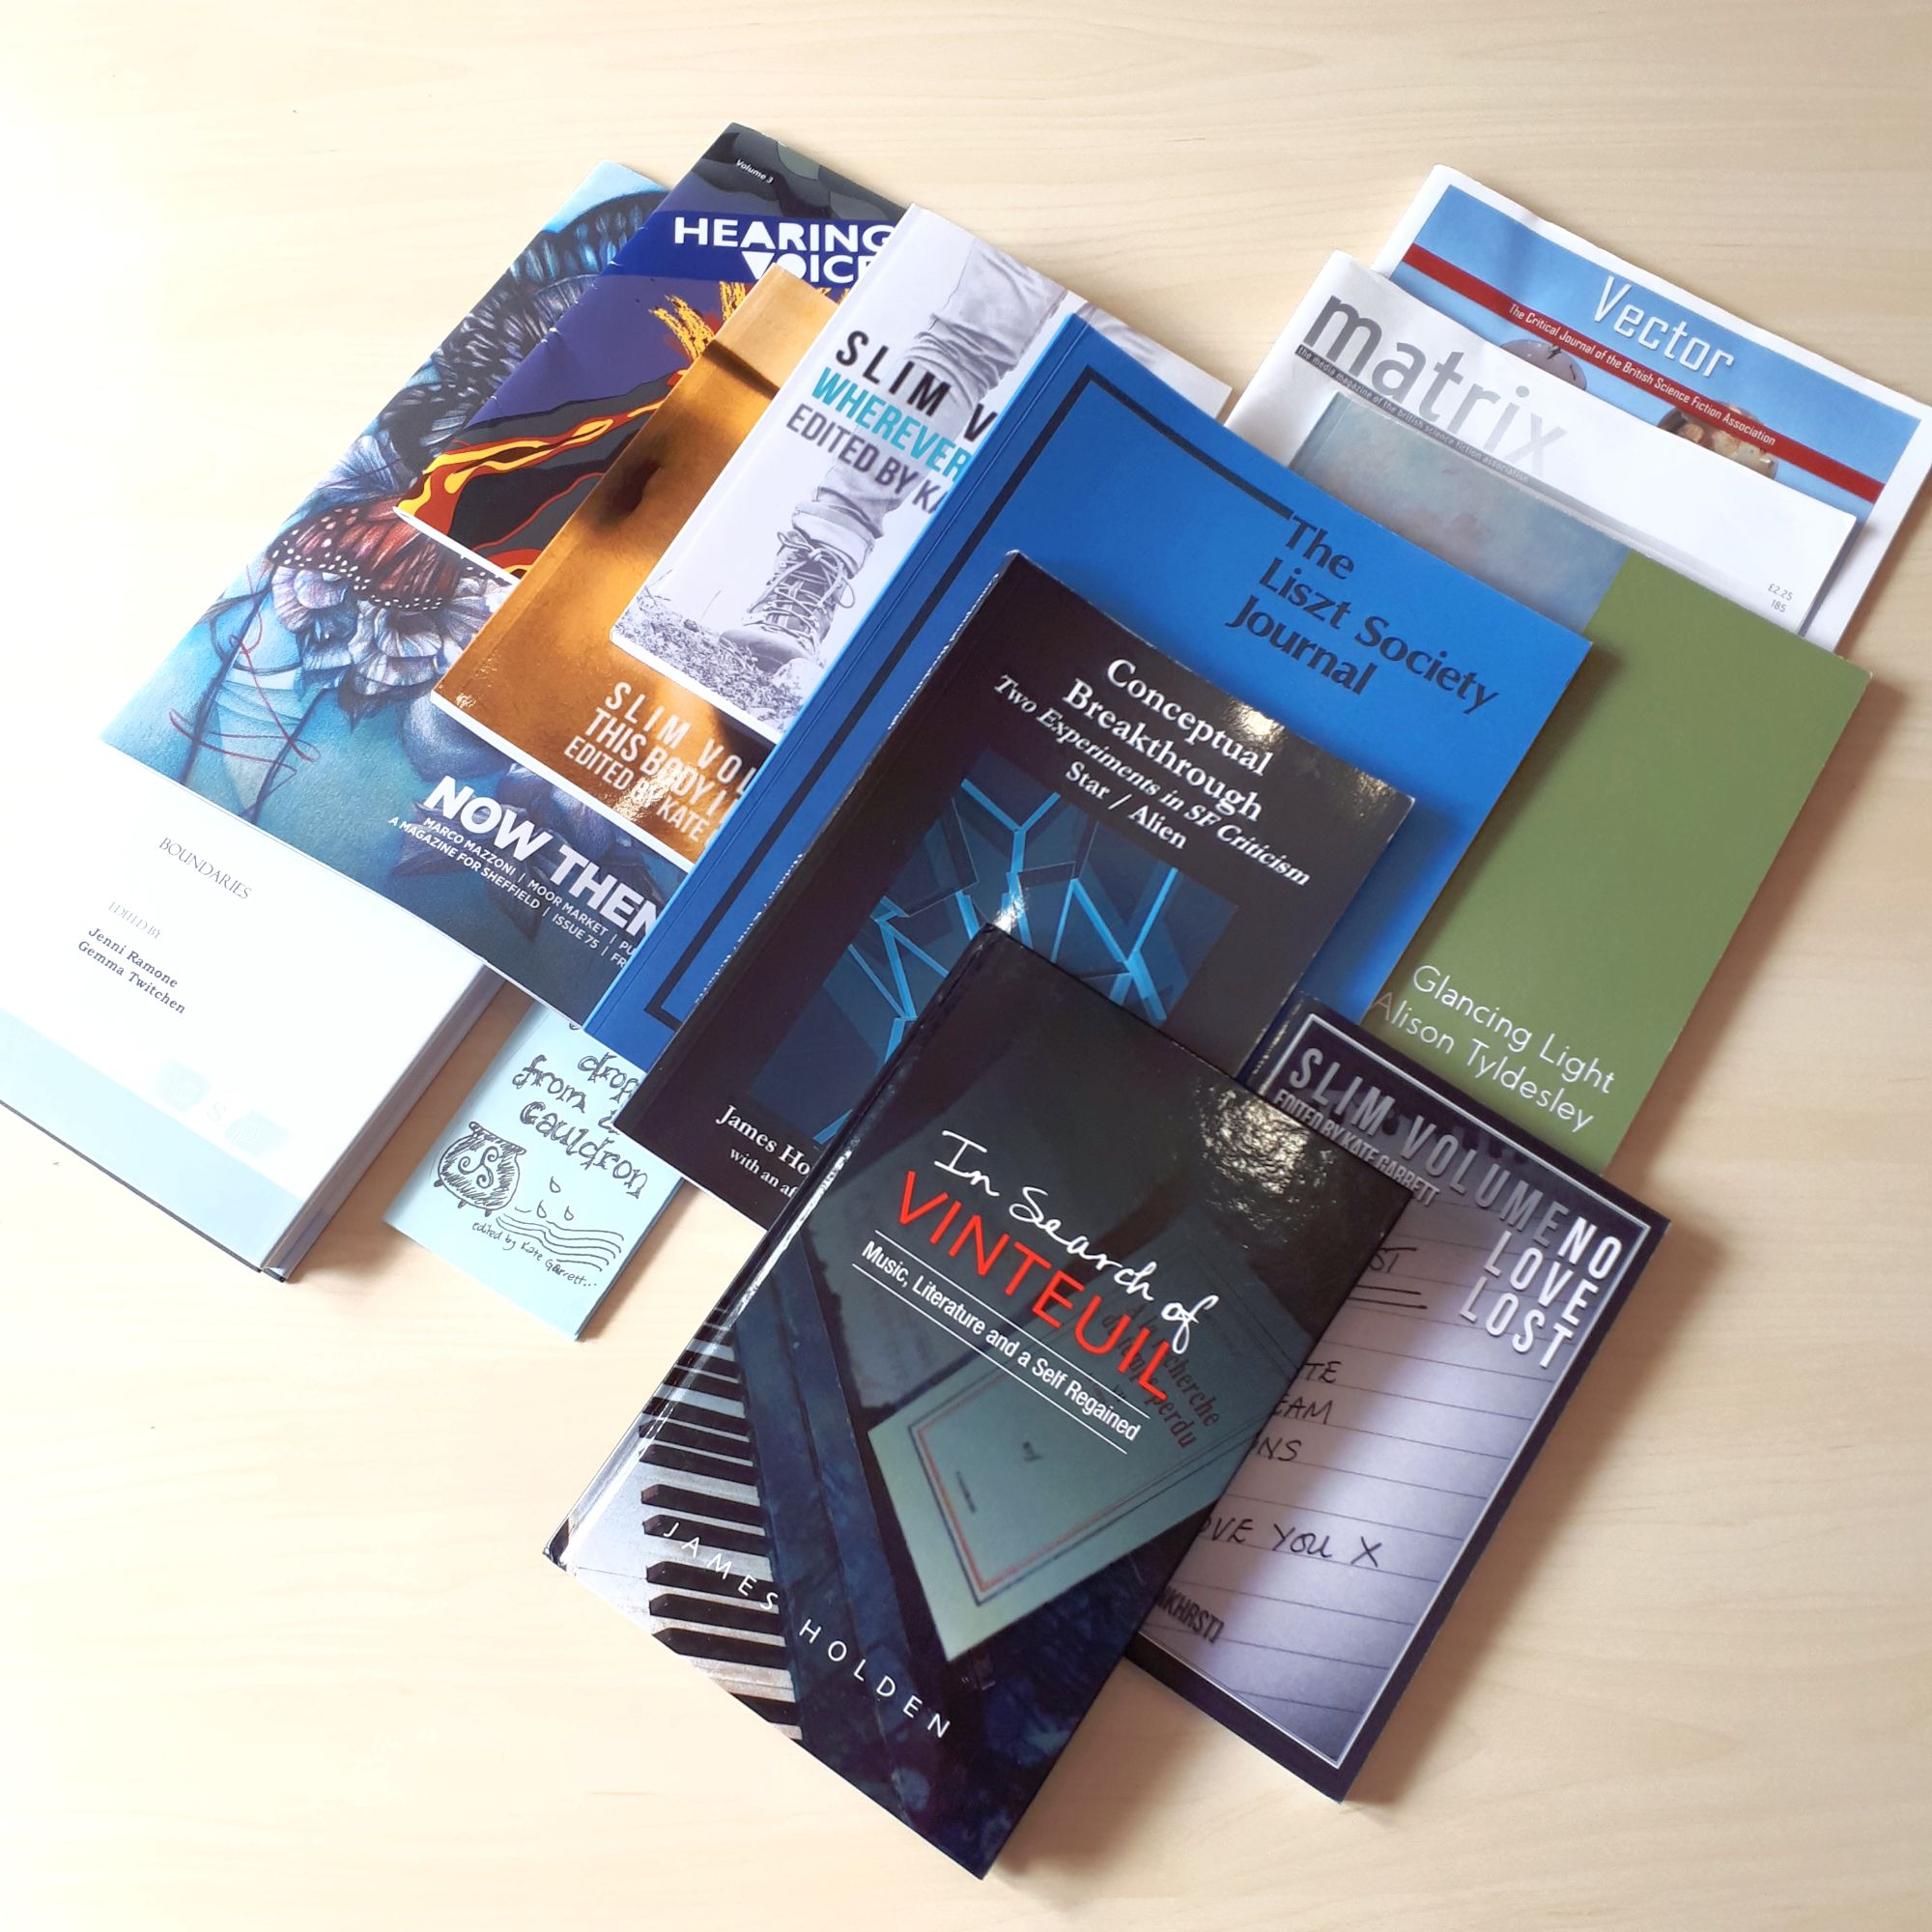 James Holden Complete Publications